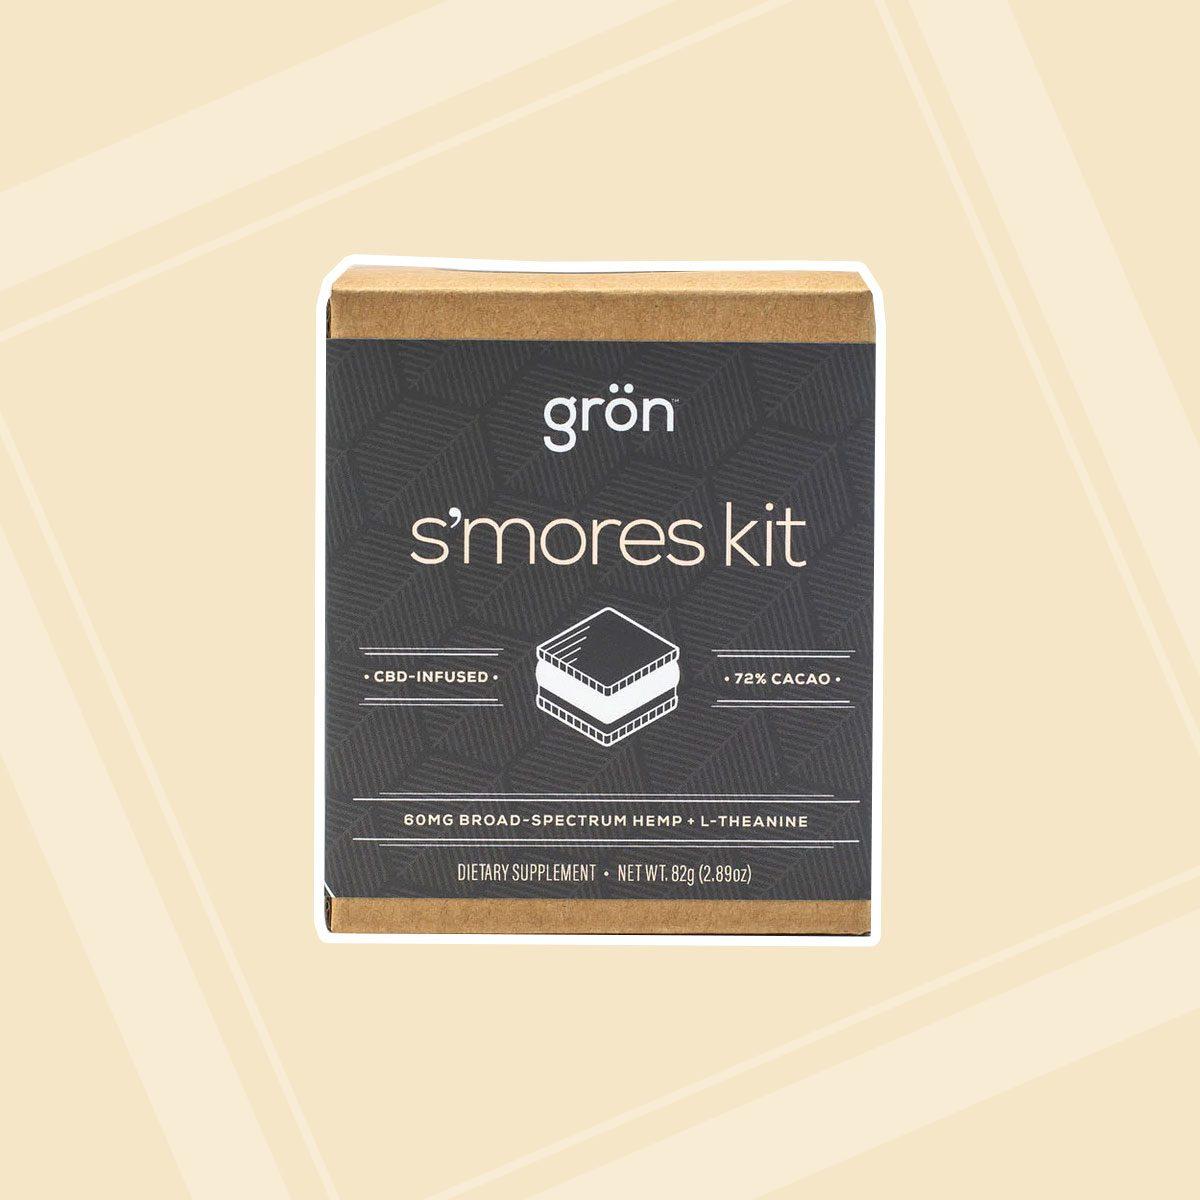 Gron Cbd Holiday 2020 Smores Kit A 64249.1610152845